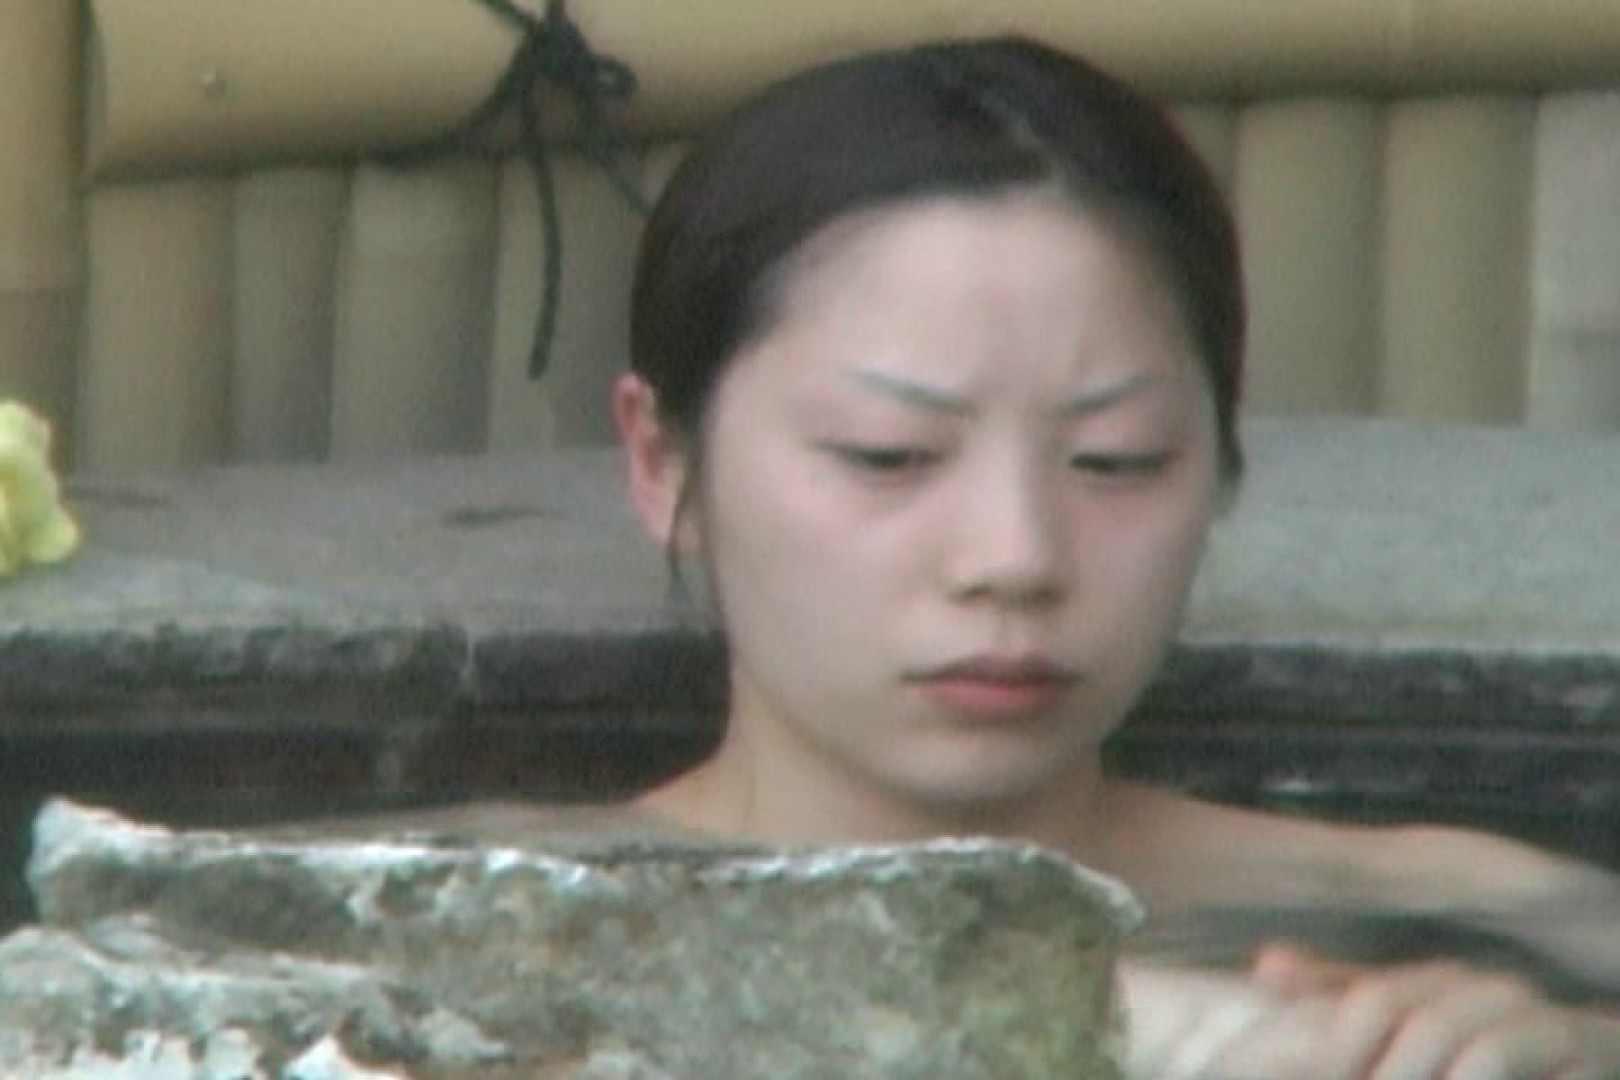 Aquaな露天風呂Vol.596 盗撮シリーズ | 露天風呂編  113PIX 17